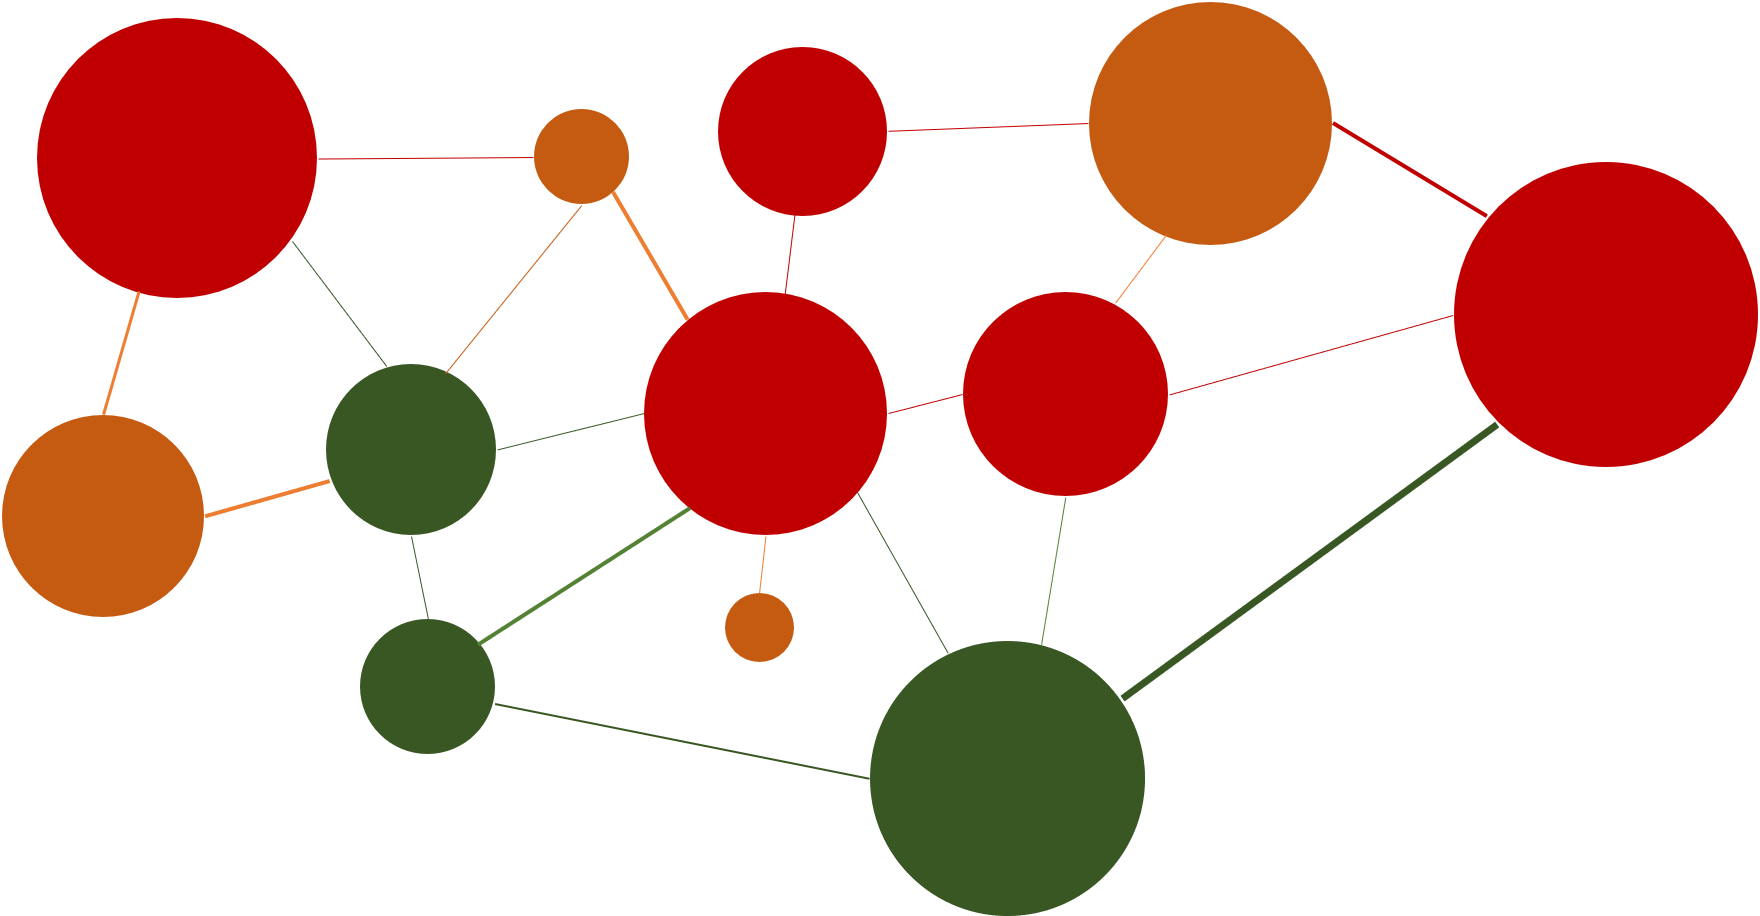 network diagram 2